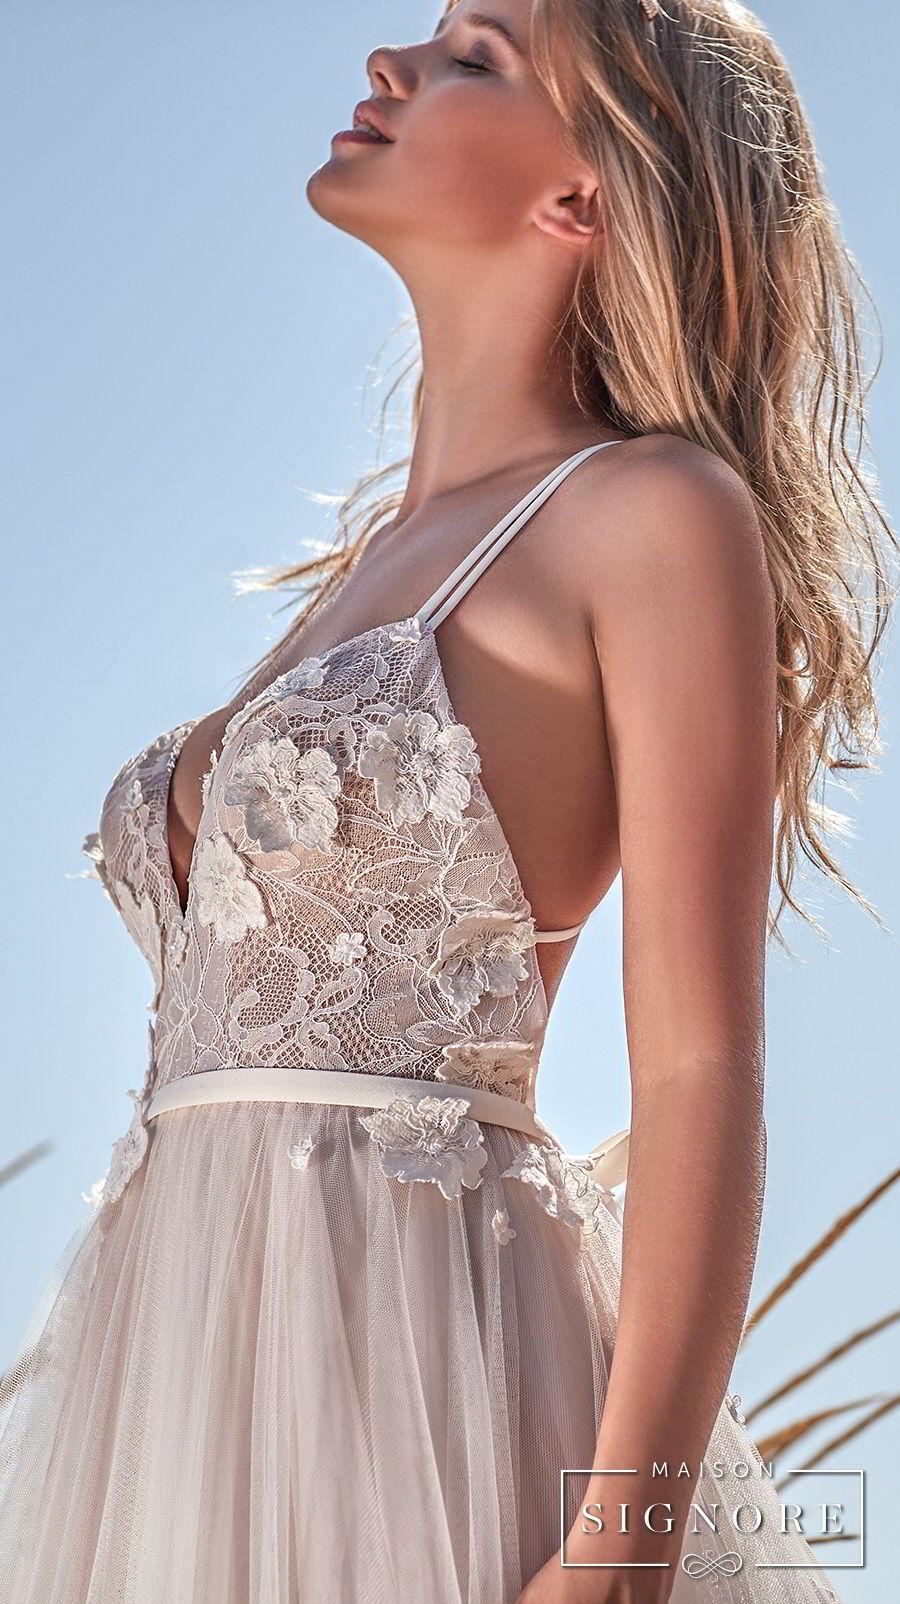 maison signore 2017 bridal thin strap sweetheart neckline heavily embellished bodice tulle skirt romantic a  line wedding dress chapel train (caroline) zsdv